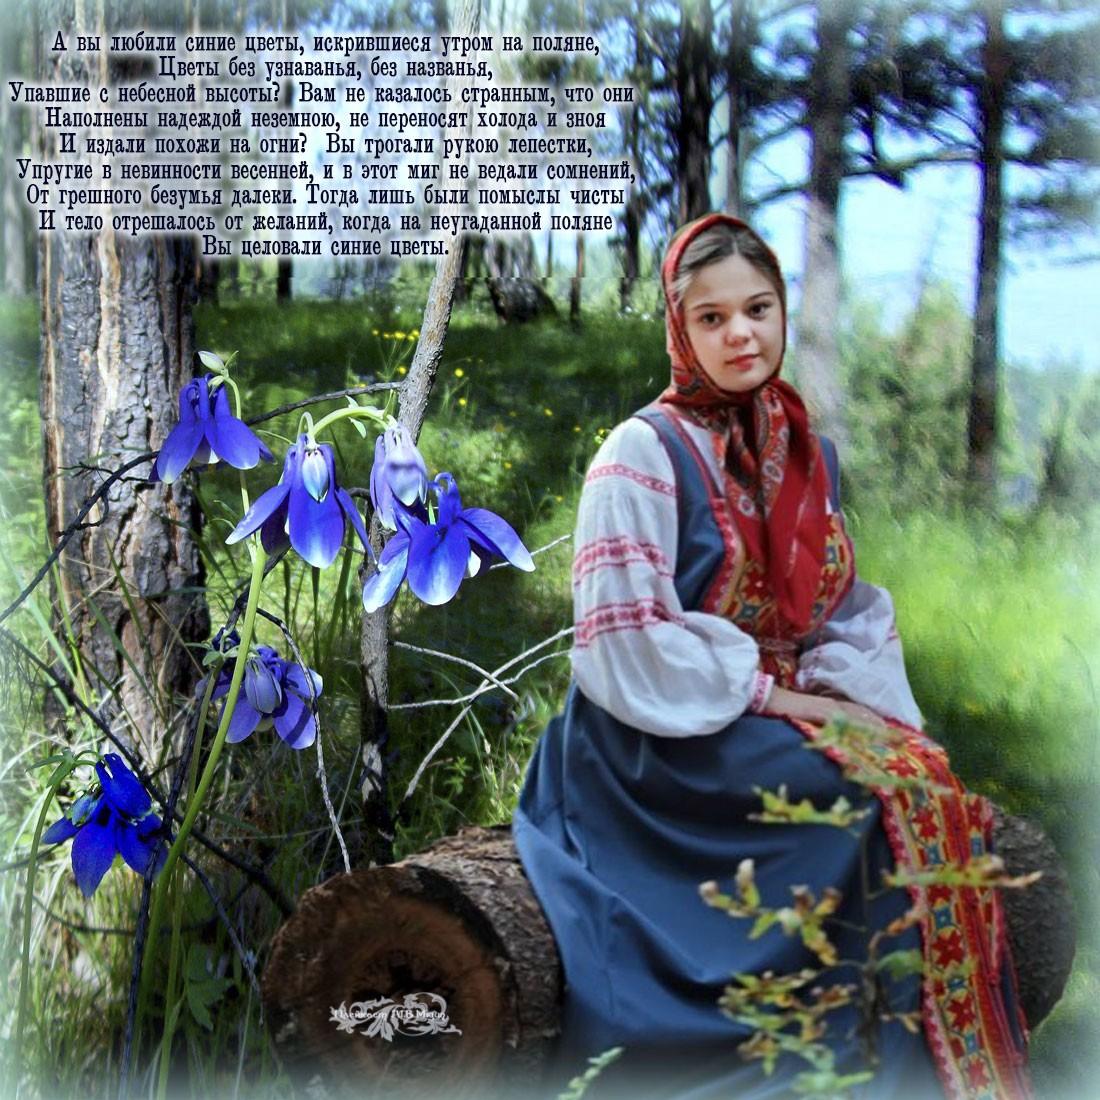 1 Синие цветы